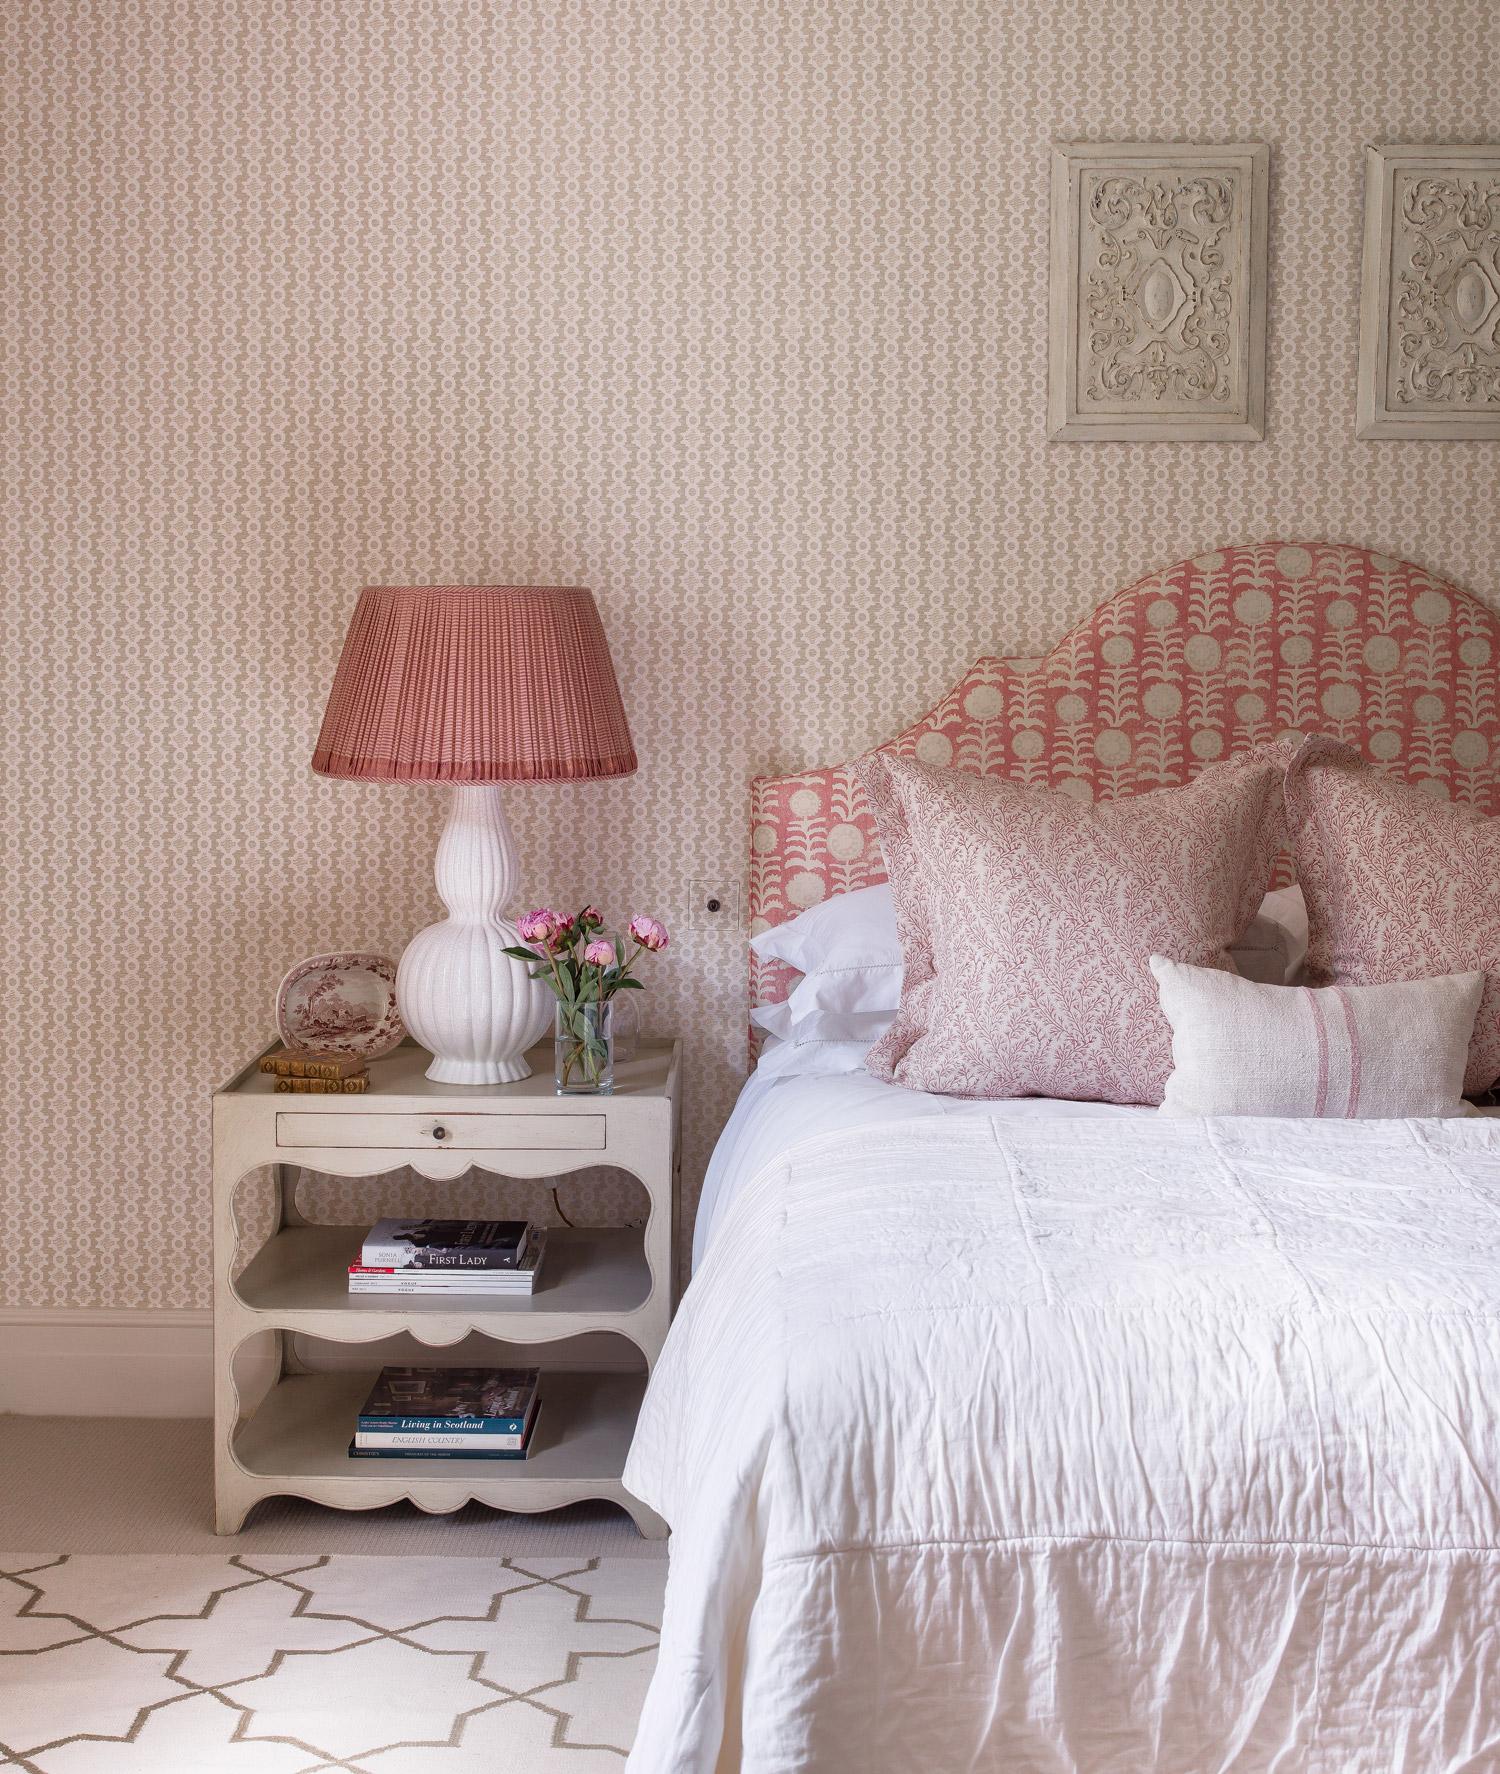 Bedroom detail – interior design by Eadie & Crole